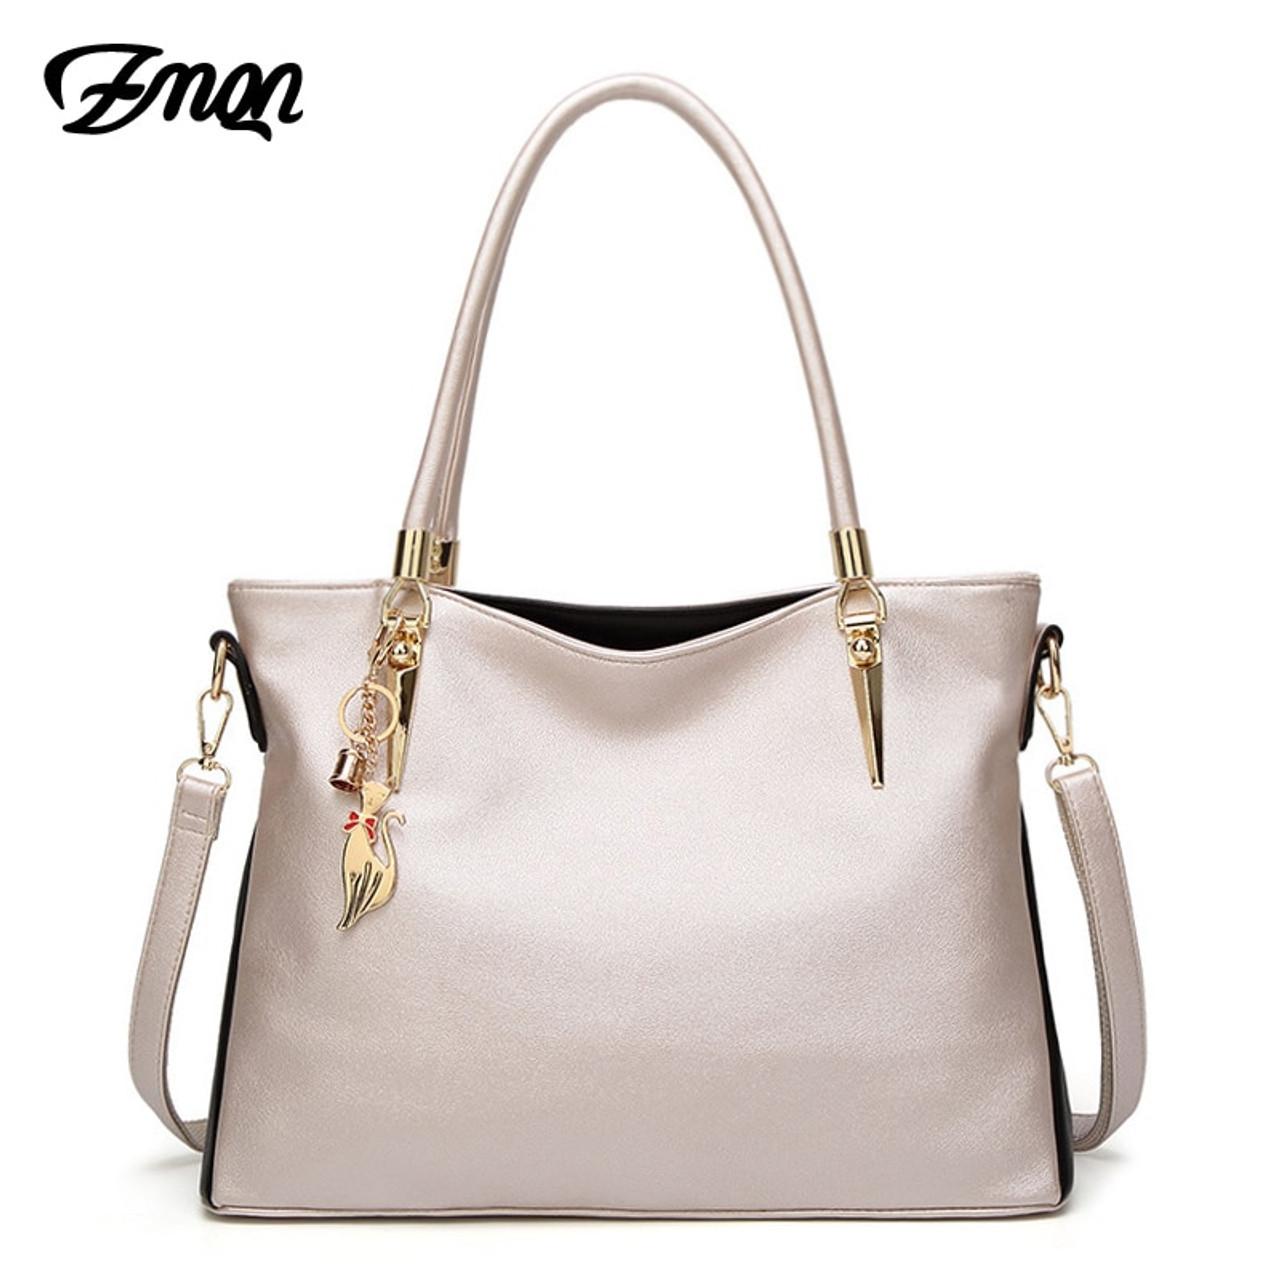 da2641bfa6 ZMQN Luxury Handbags Women Bag Designer 2018 PU Soft Leather Shoulder Bags  for Women Famous Brand ...